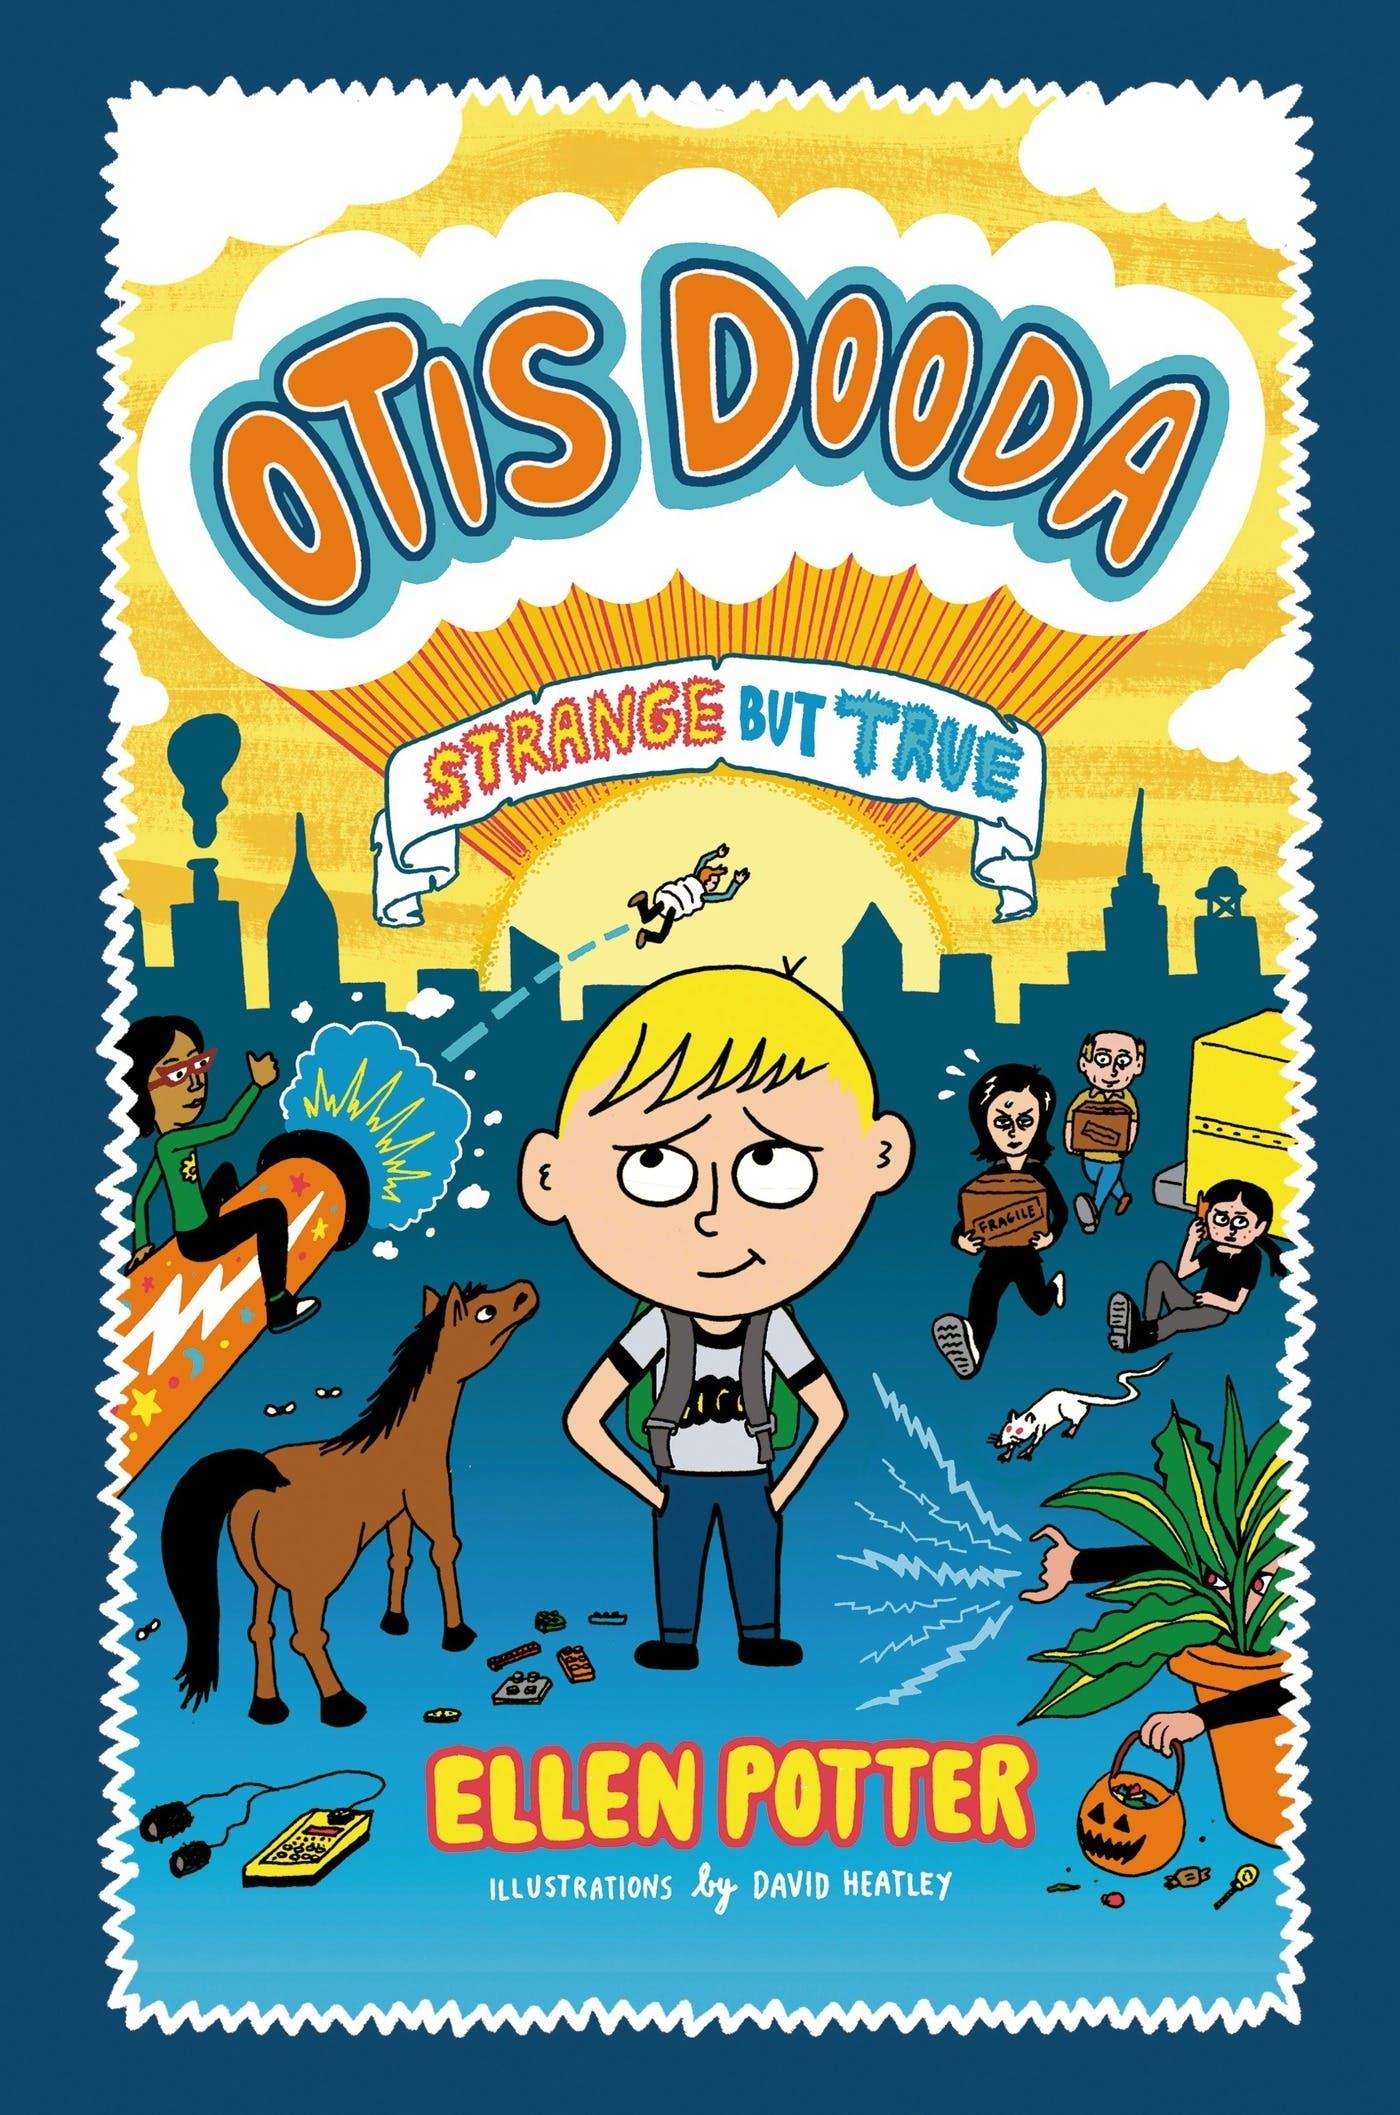 Image of Otis Dooda